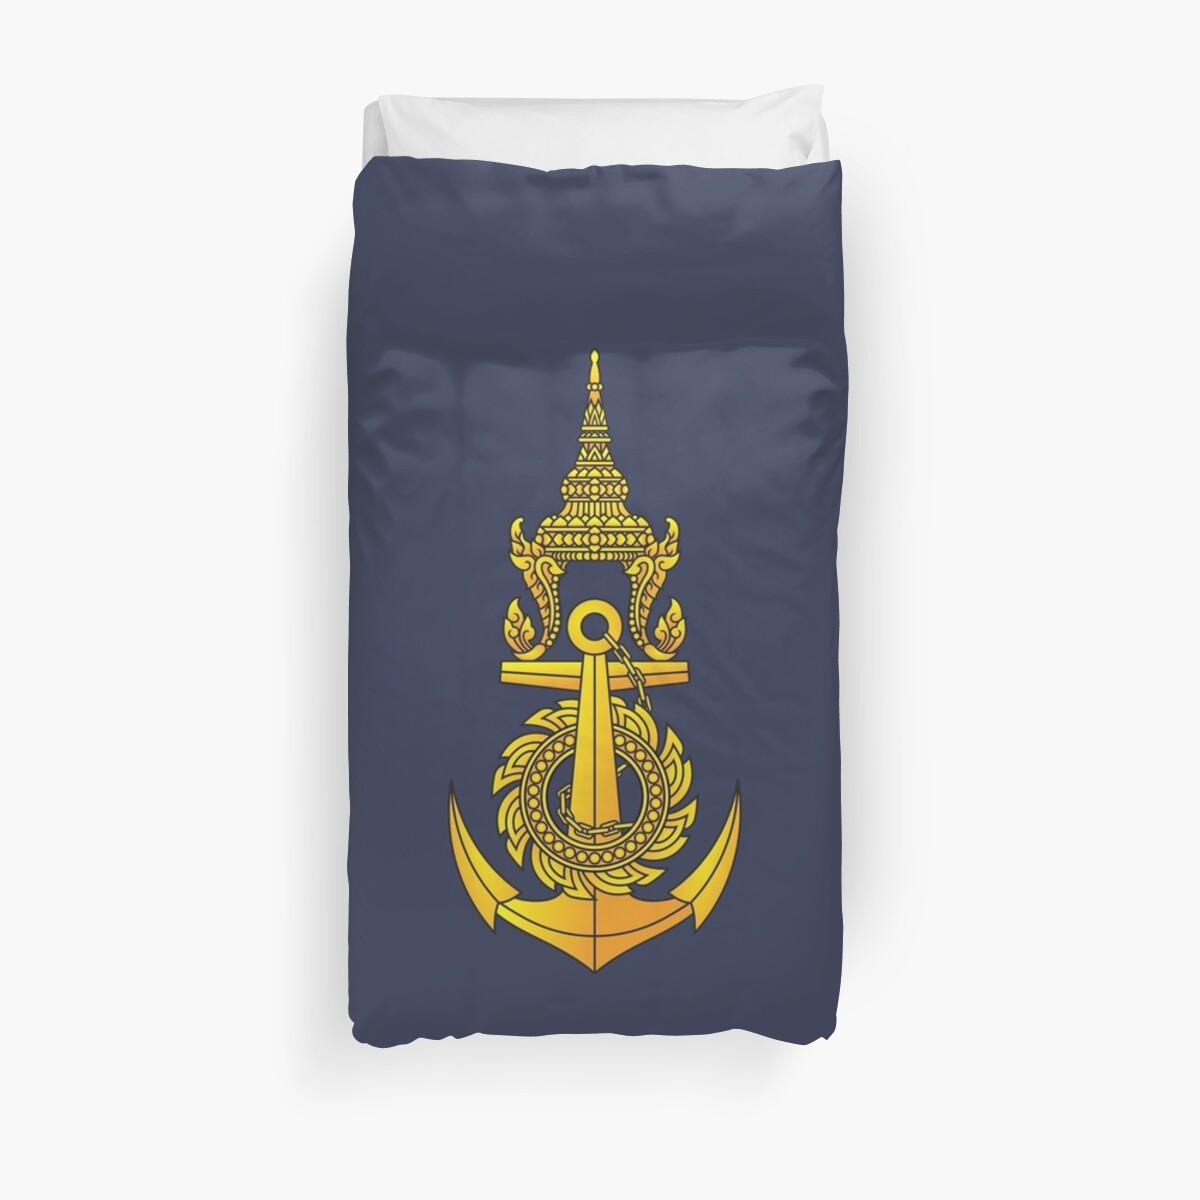 'Royal Thai Navy - กองทัพเรือไทย' Duvet Cover by wordwidesymbols